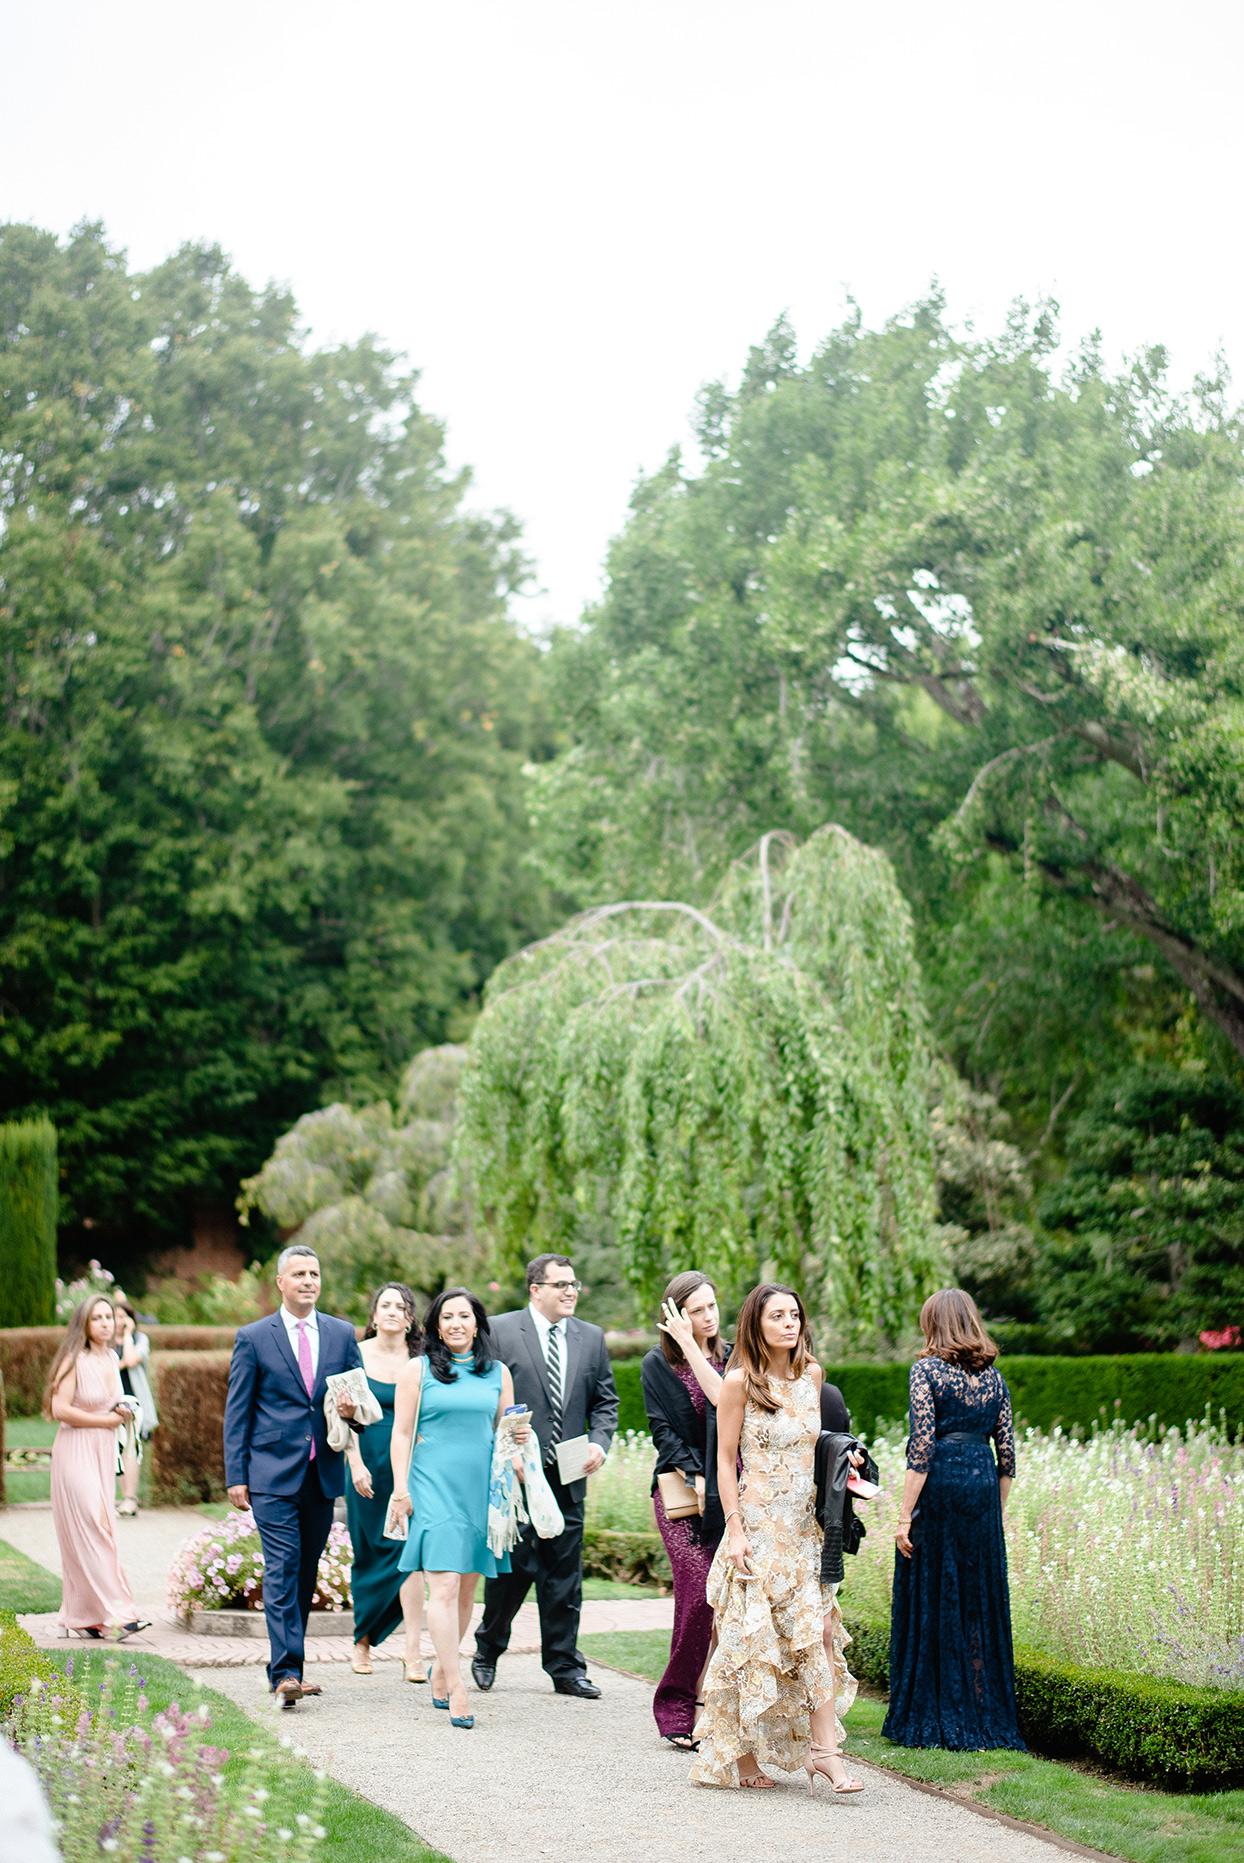 yalda anusha wedding guests walking in garden